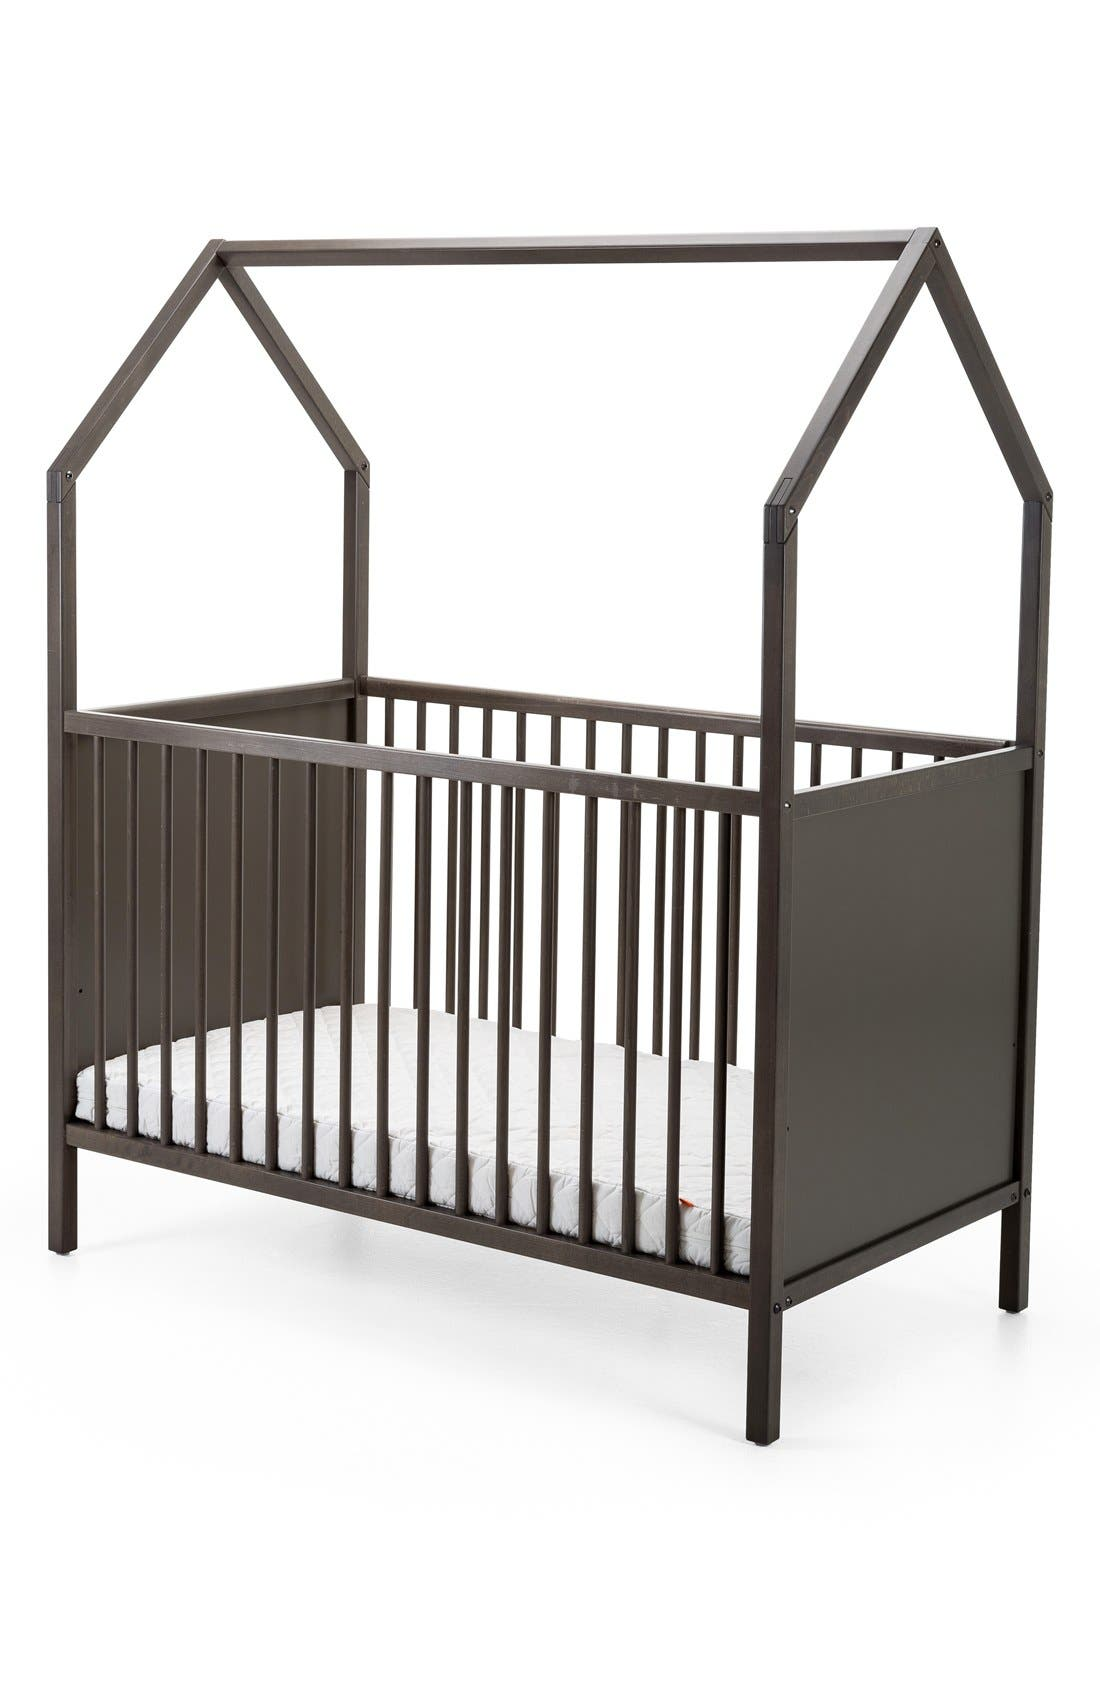 Stokke 'Home™' Bed